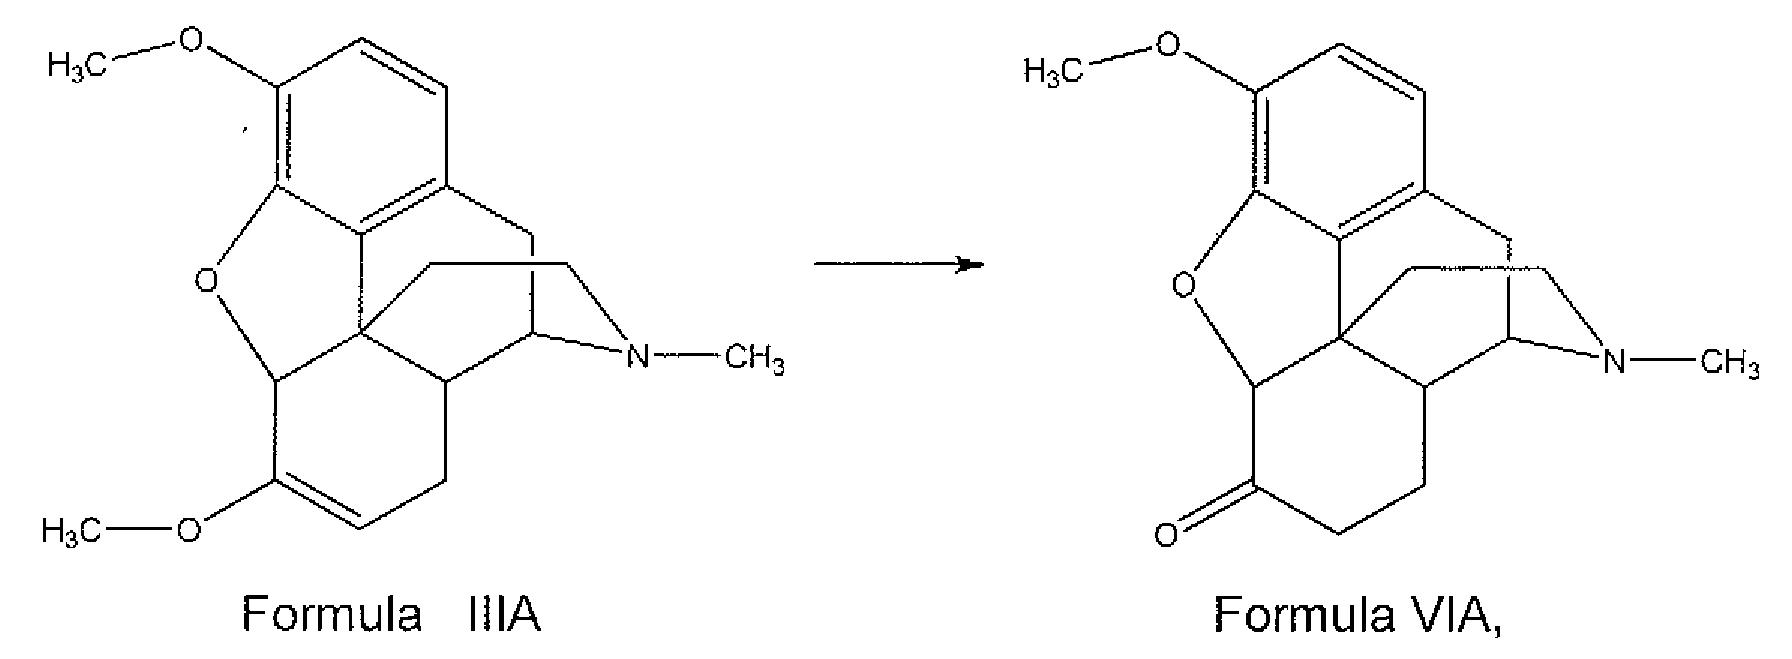 vs oxycodone oxymorphone hydromorphone